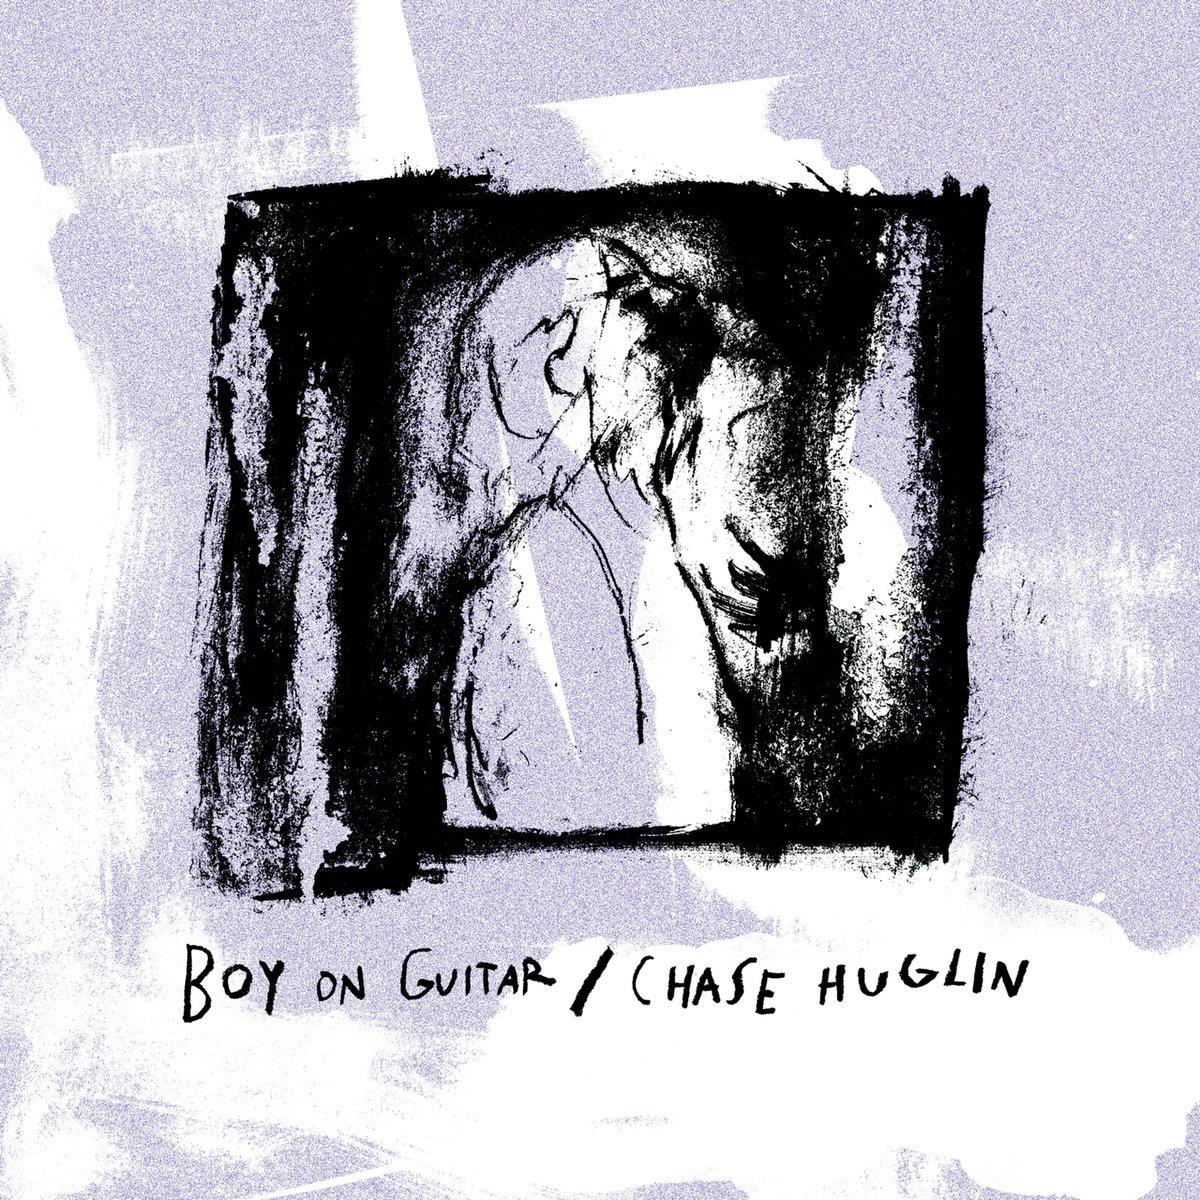 Boy On Guitar / Chase Huglin - Split